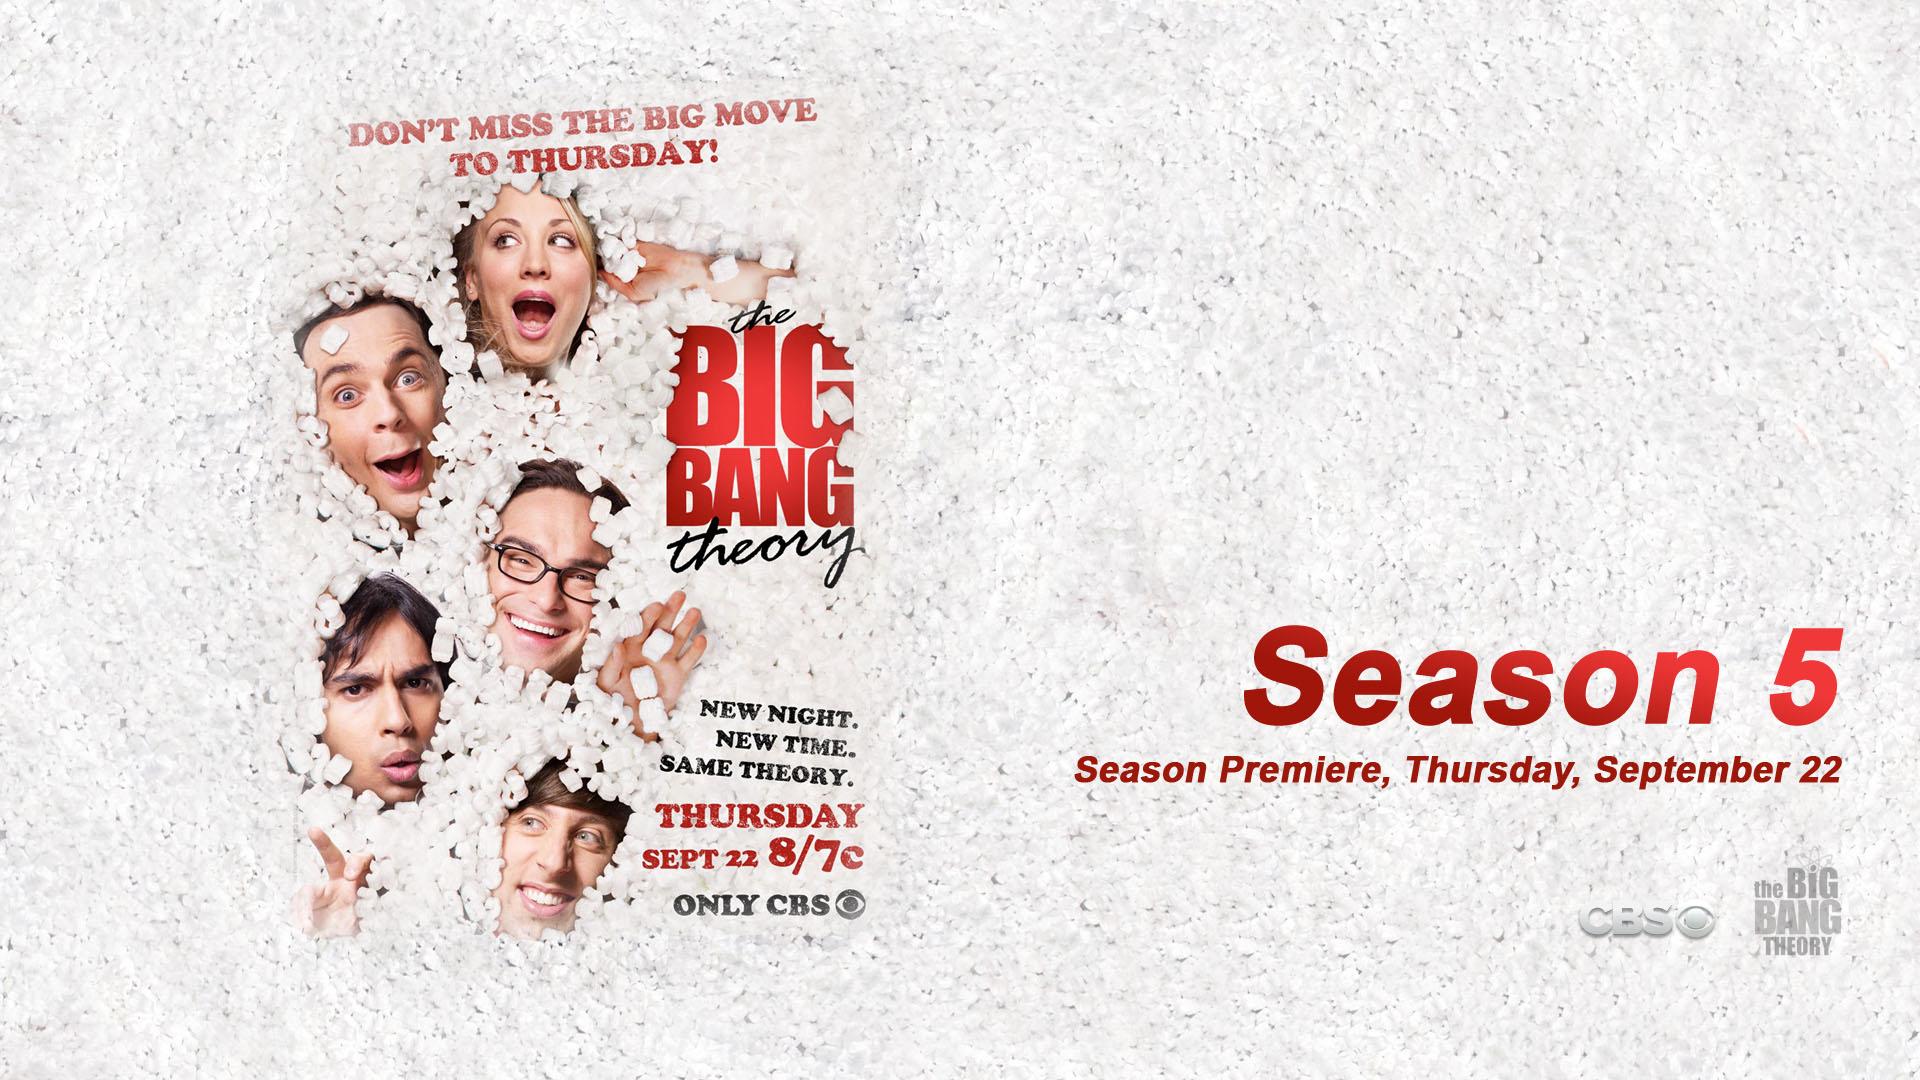 The Big Bang Theory Hd Wallpaper Background Image 1920x1080